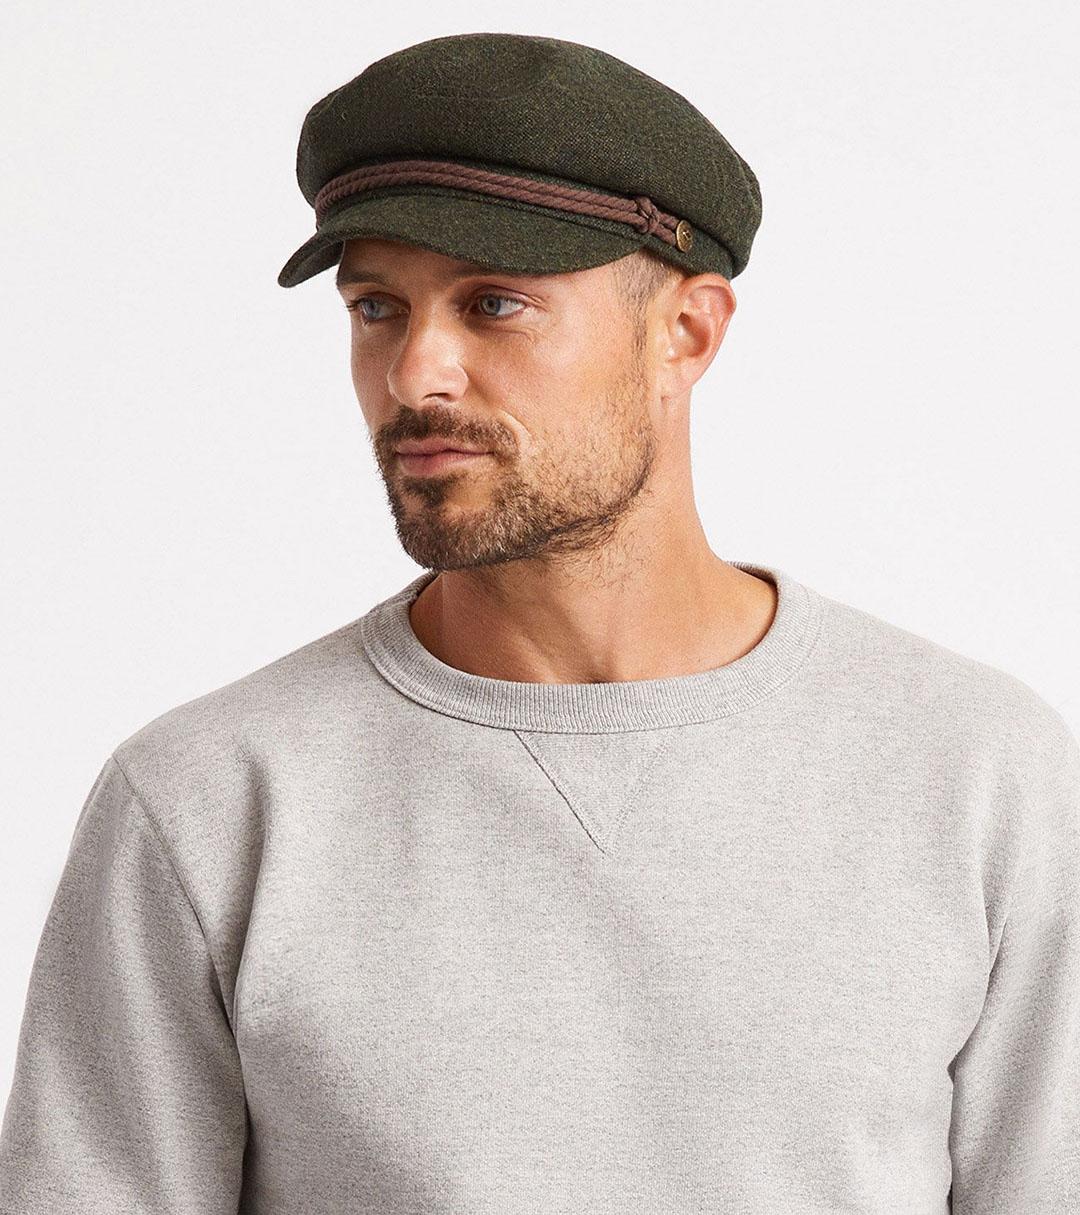 Men's Mariner Caps